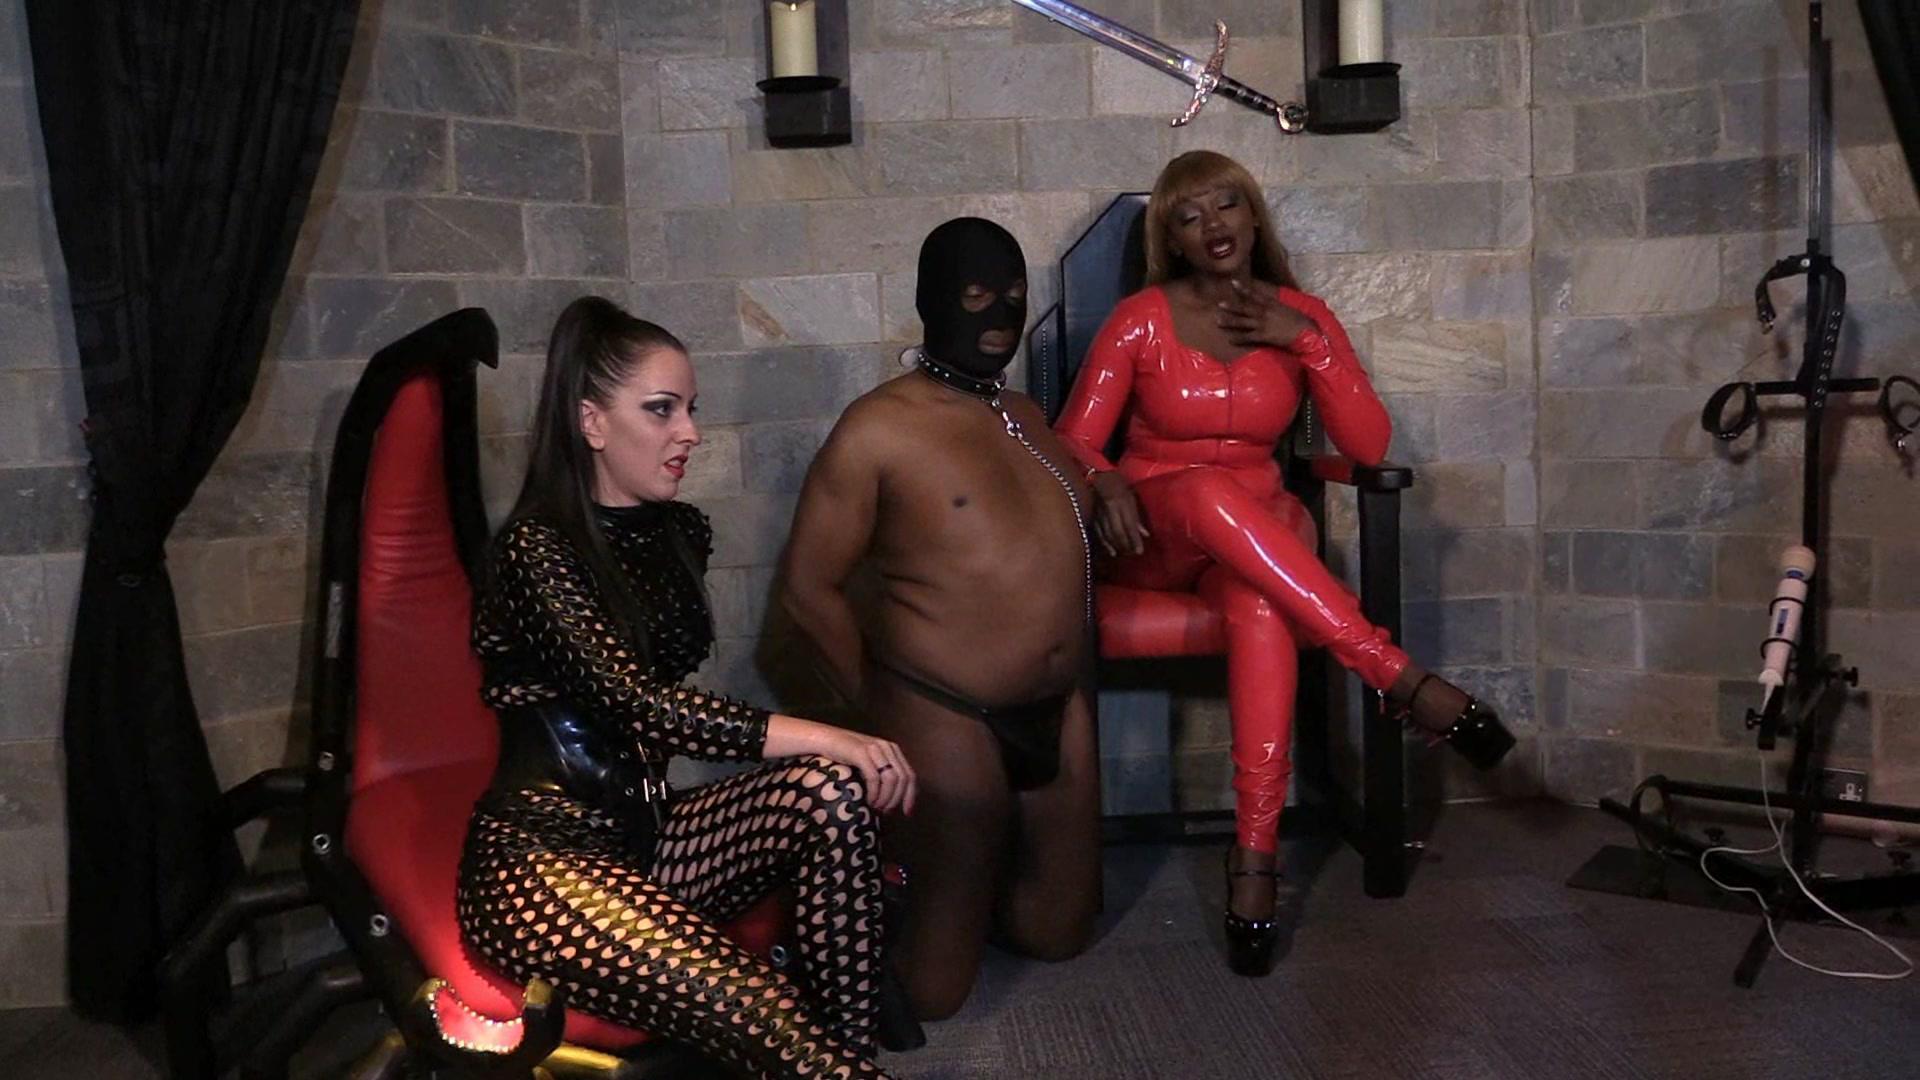 Real femdom castration wmv nude hotties milf